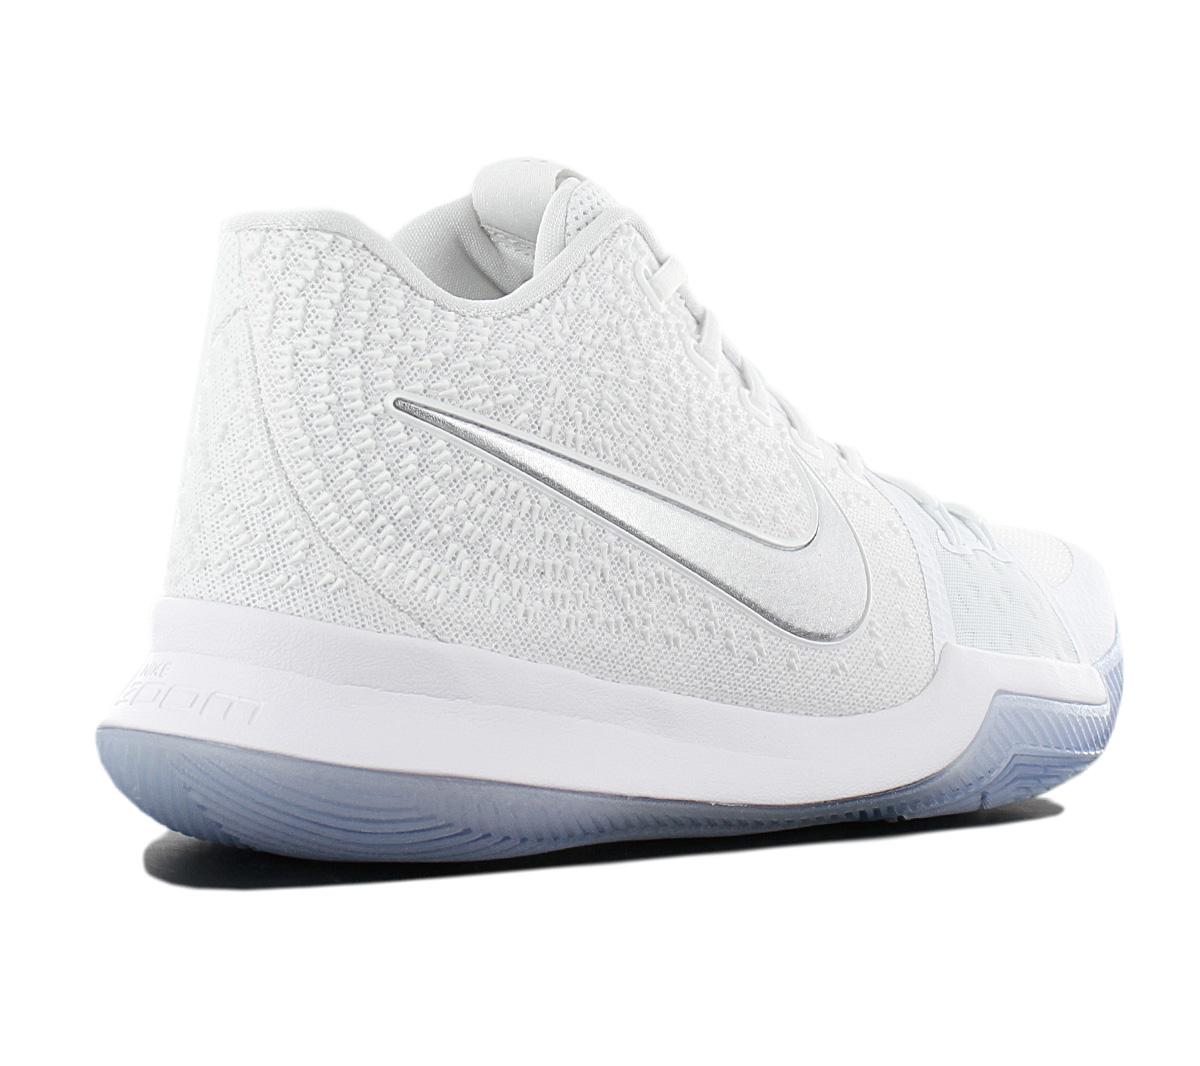 369c9d504082 Nike Irving Kyrie 3